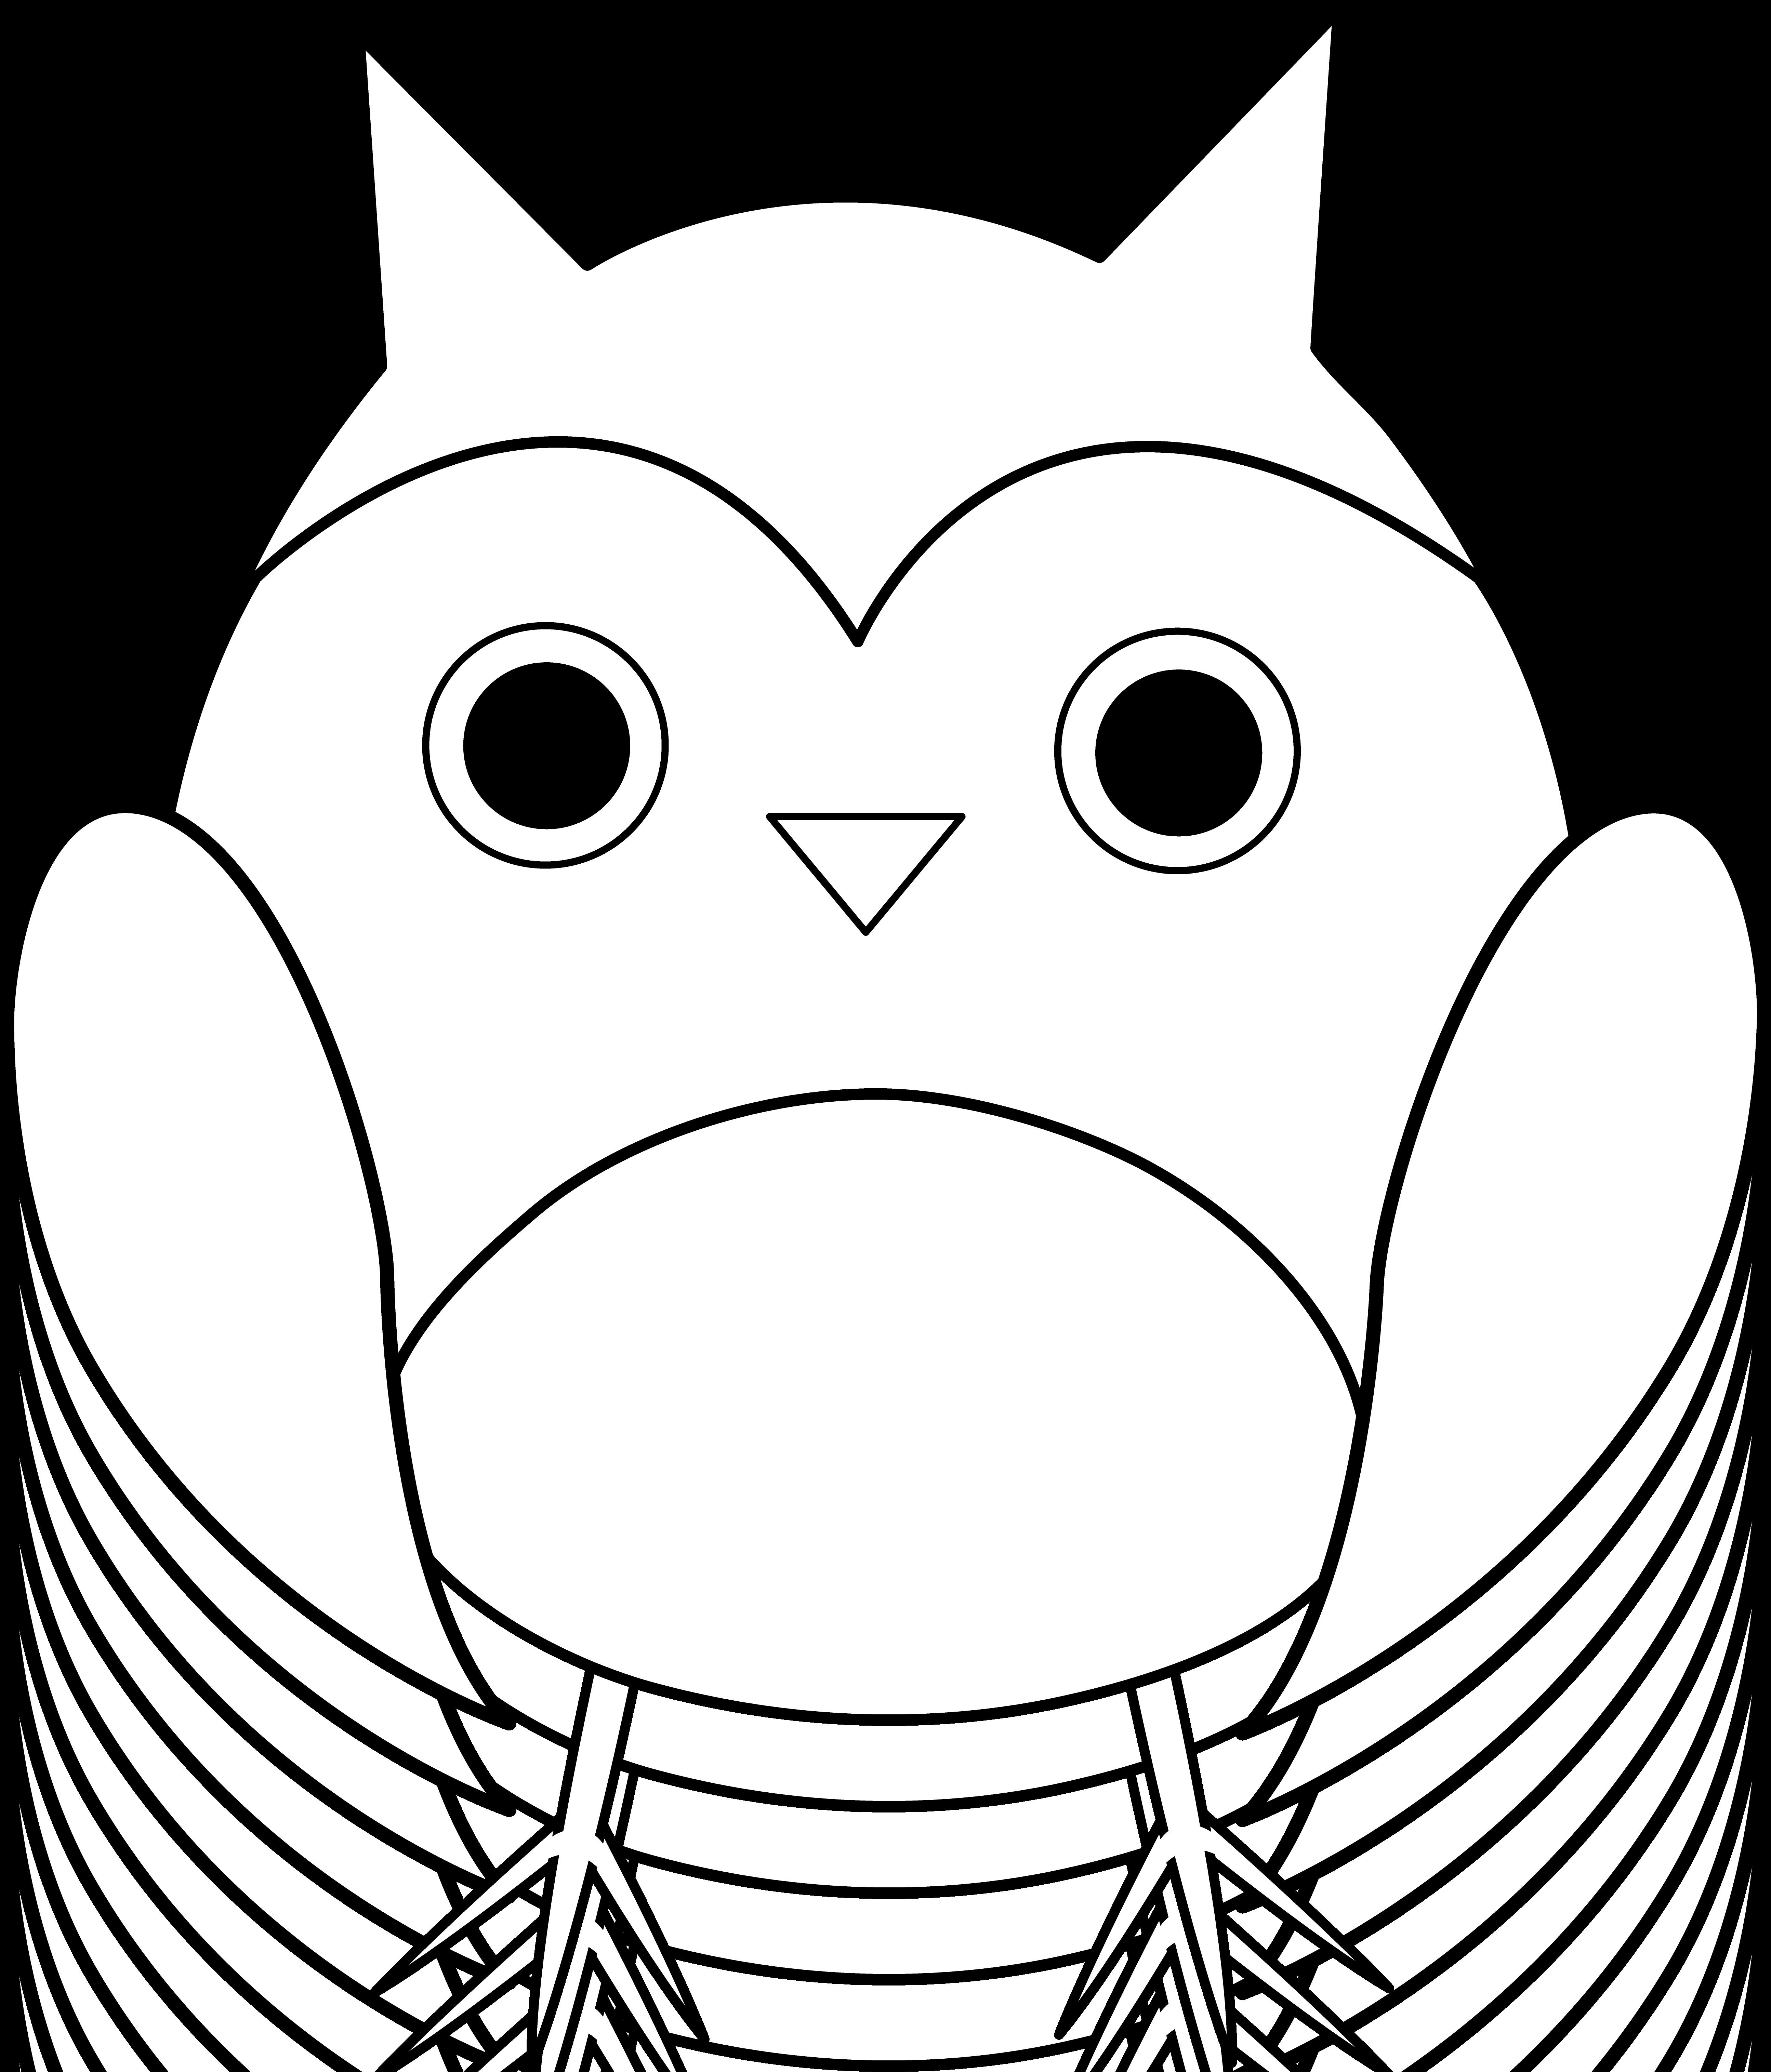 5179x6060 Transparent Owl Black And White Huge Freebie! Download